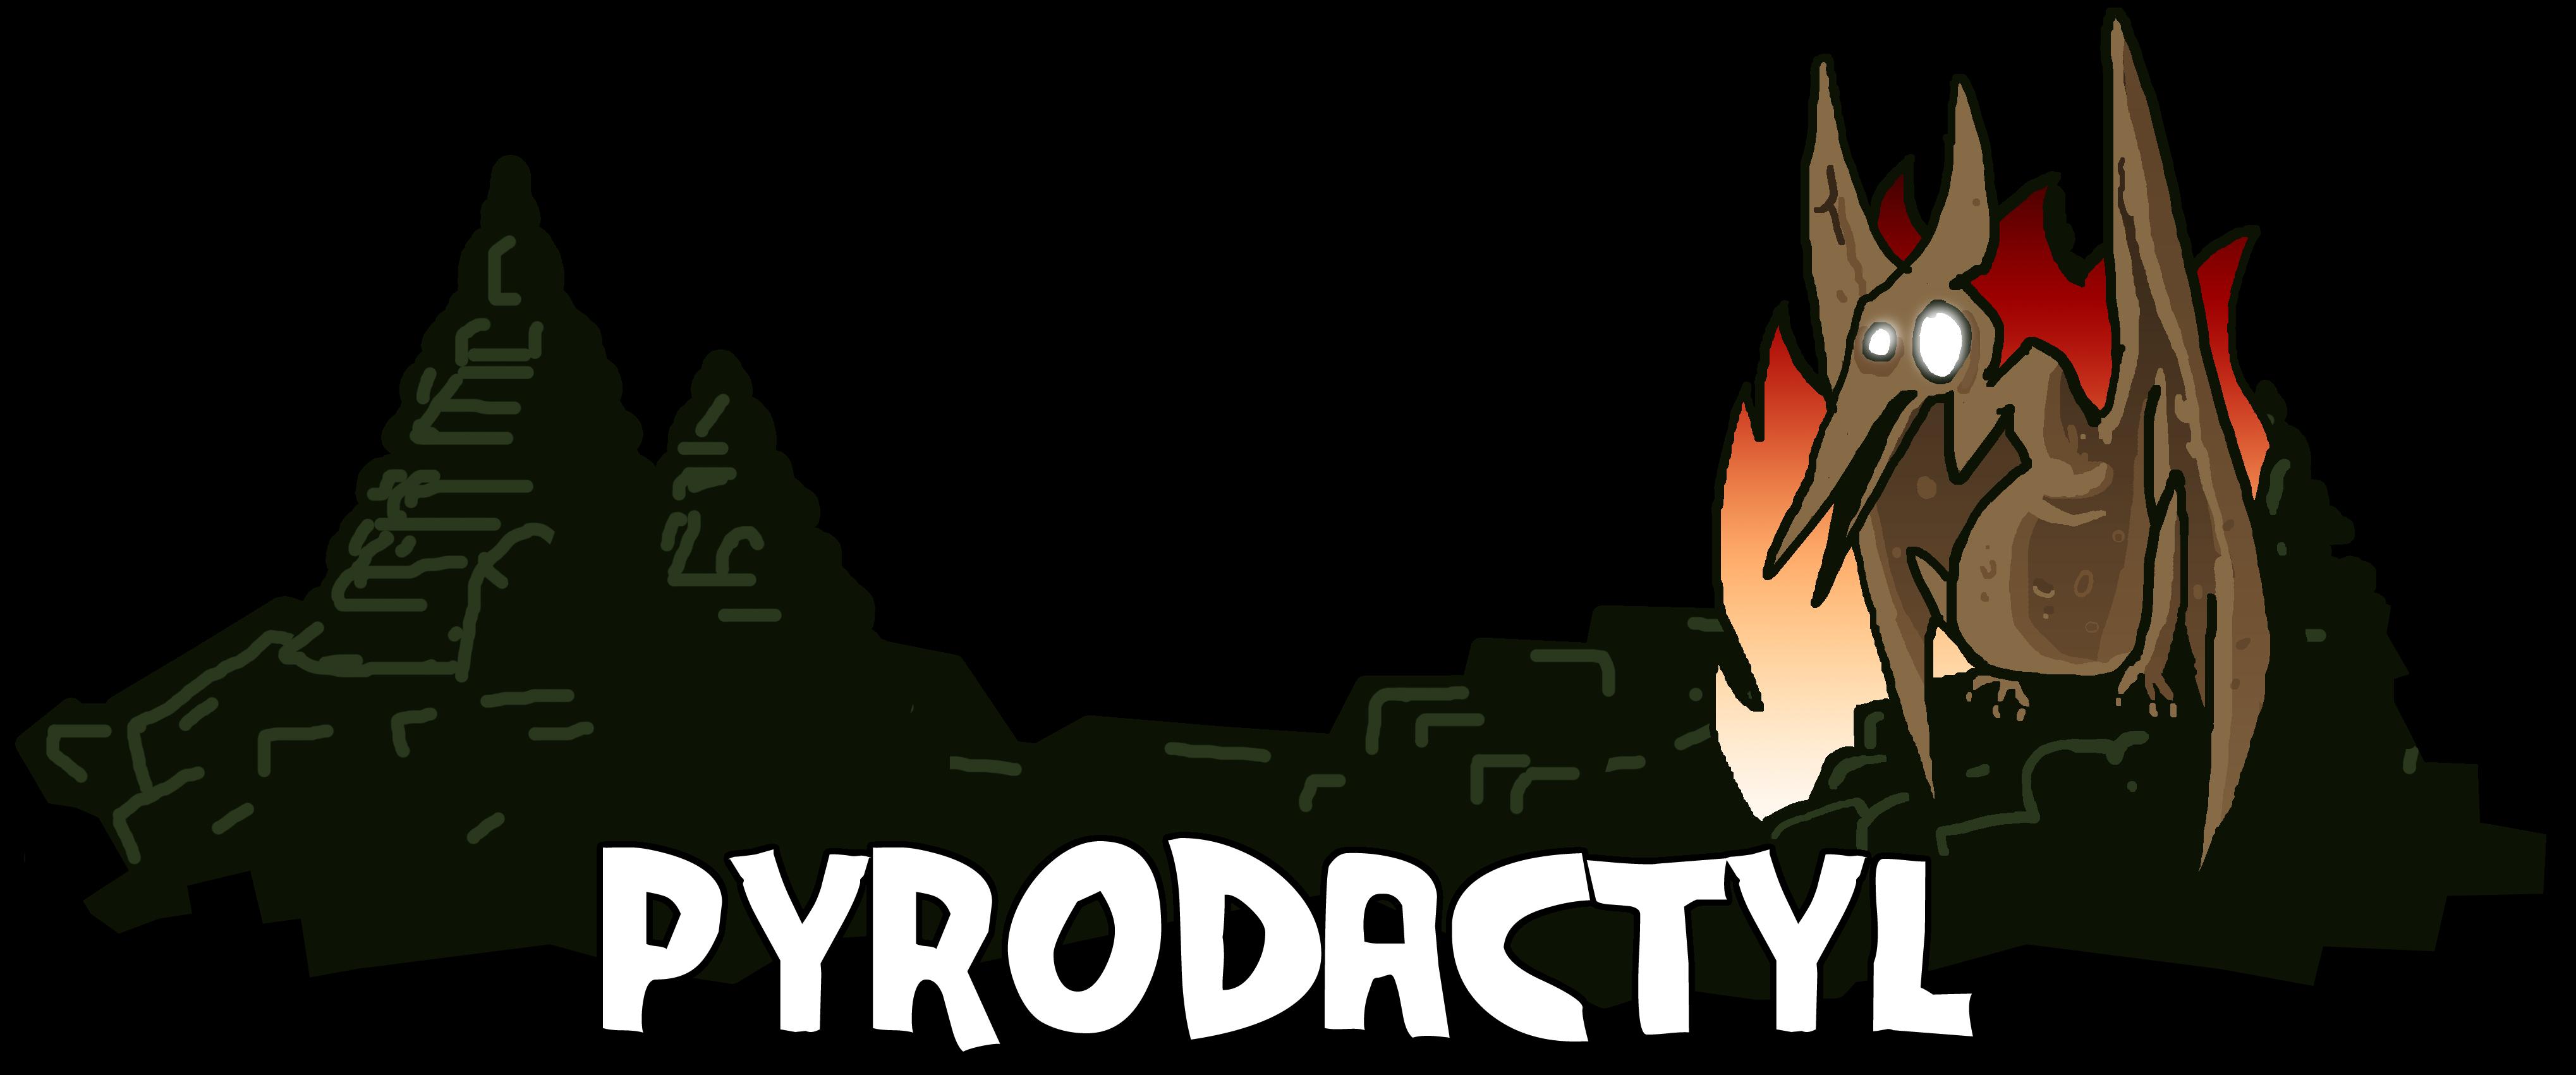 Pyrodactyl Logo, Landscape